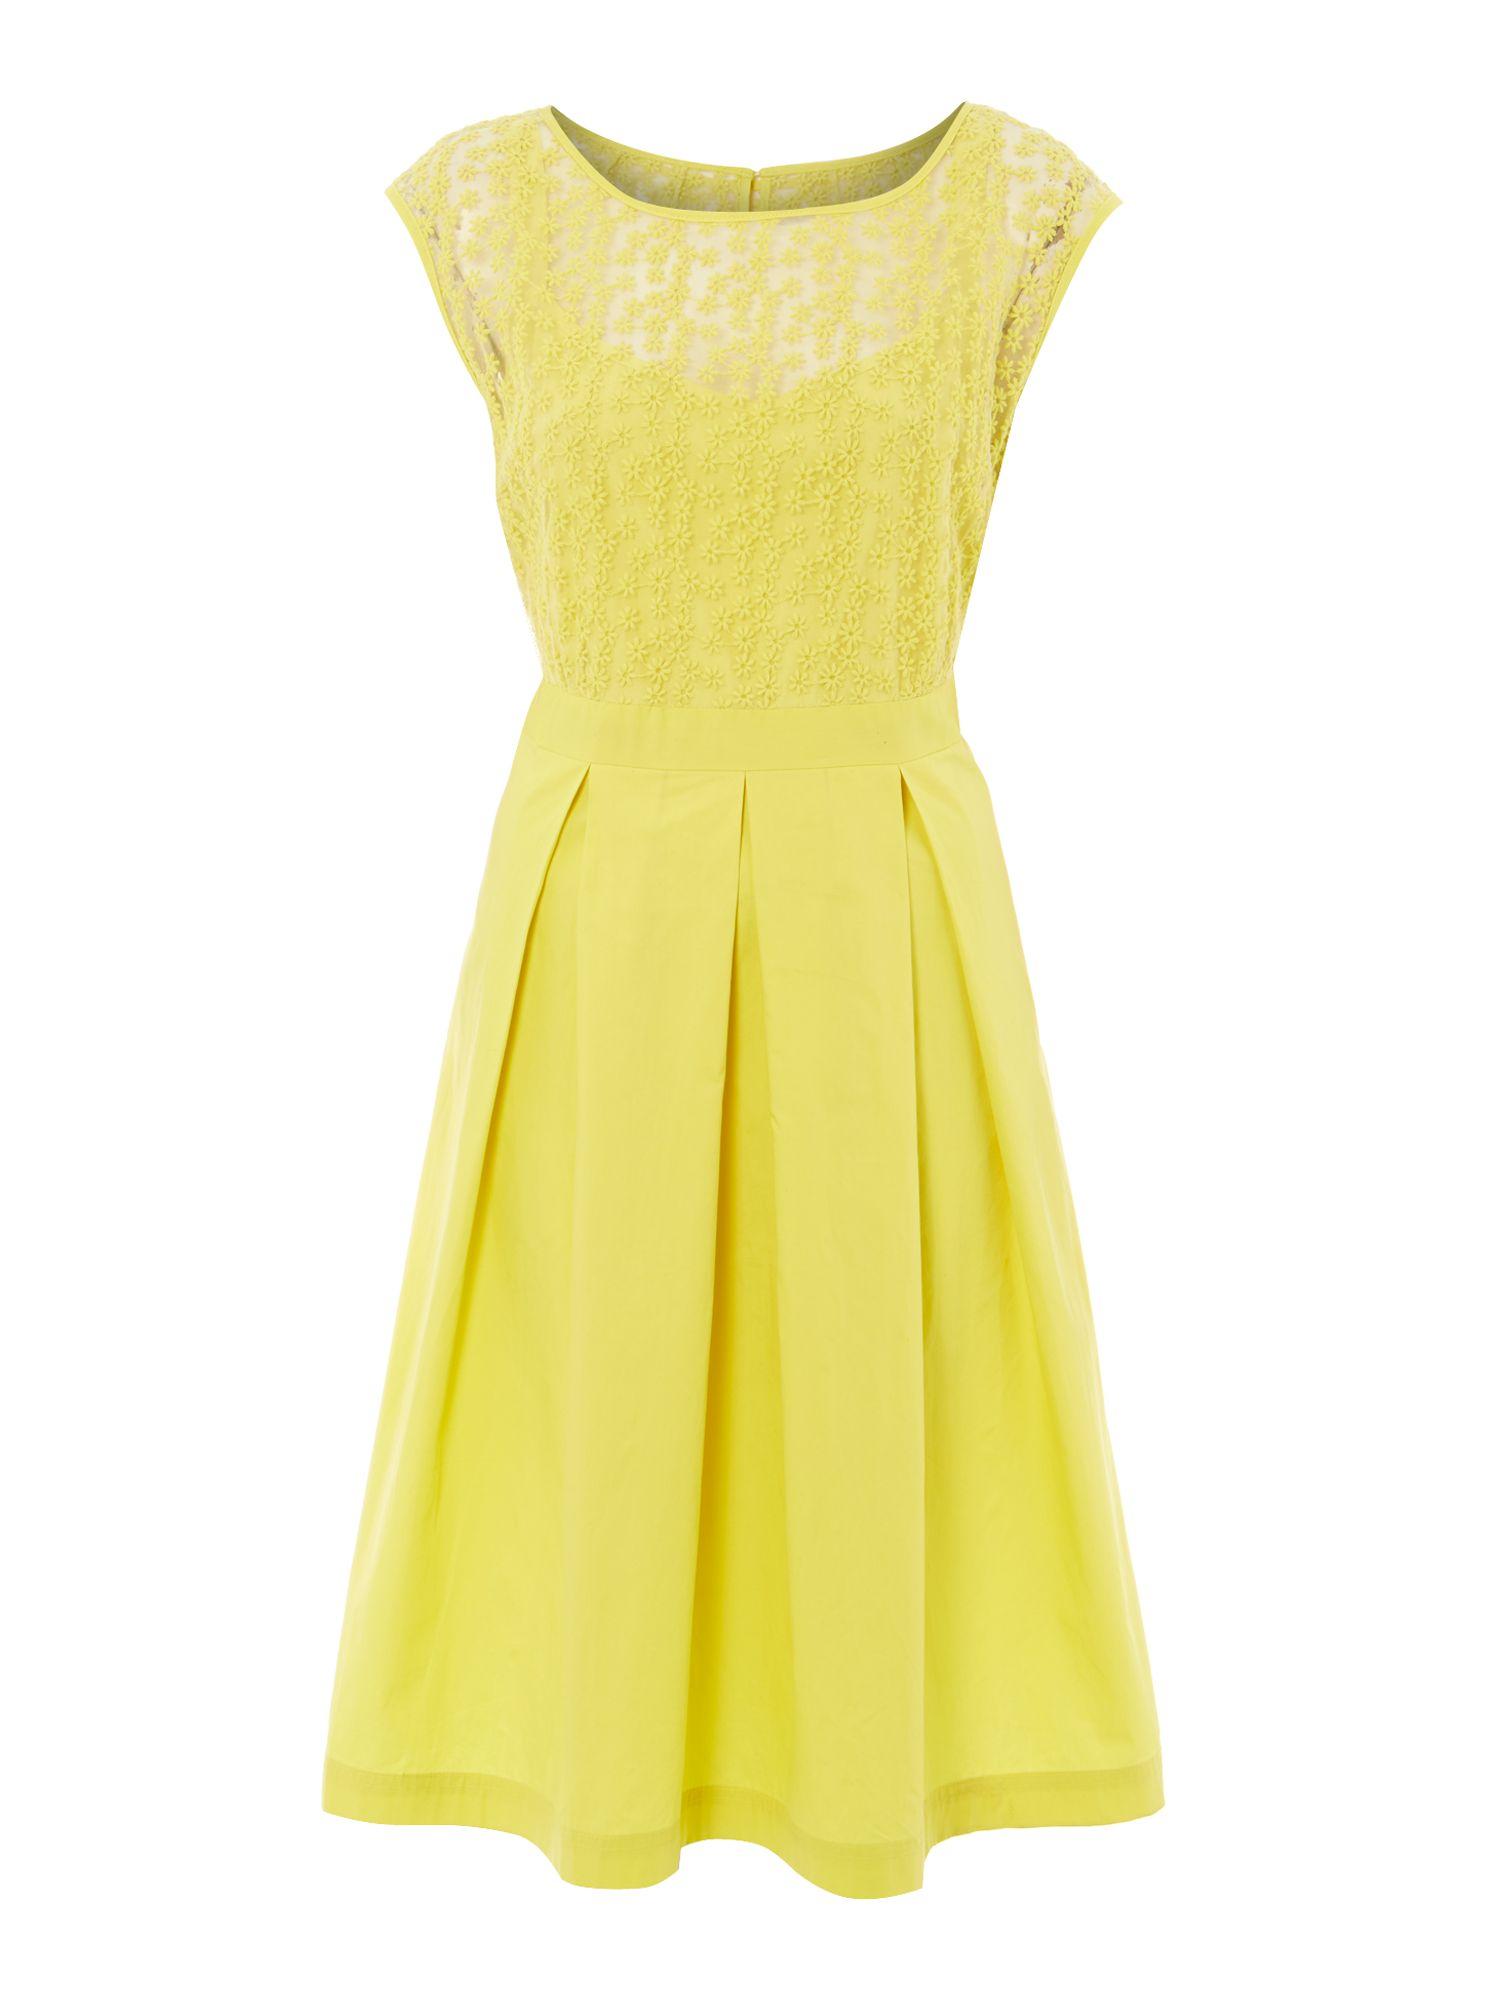 Ladies Yellow Flower Dress Dress Online Uk